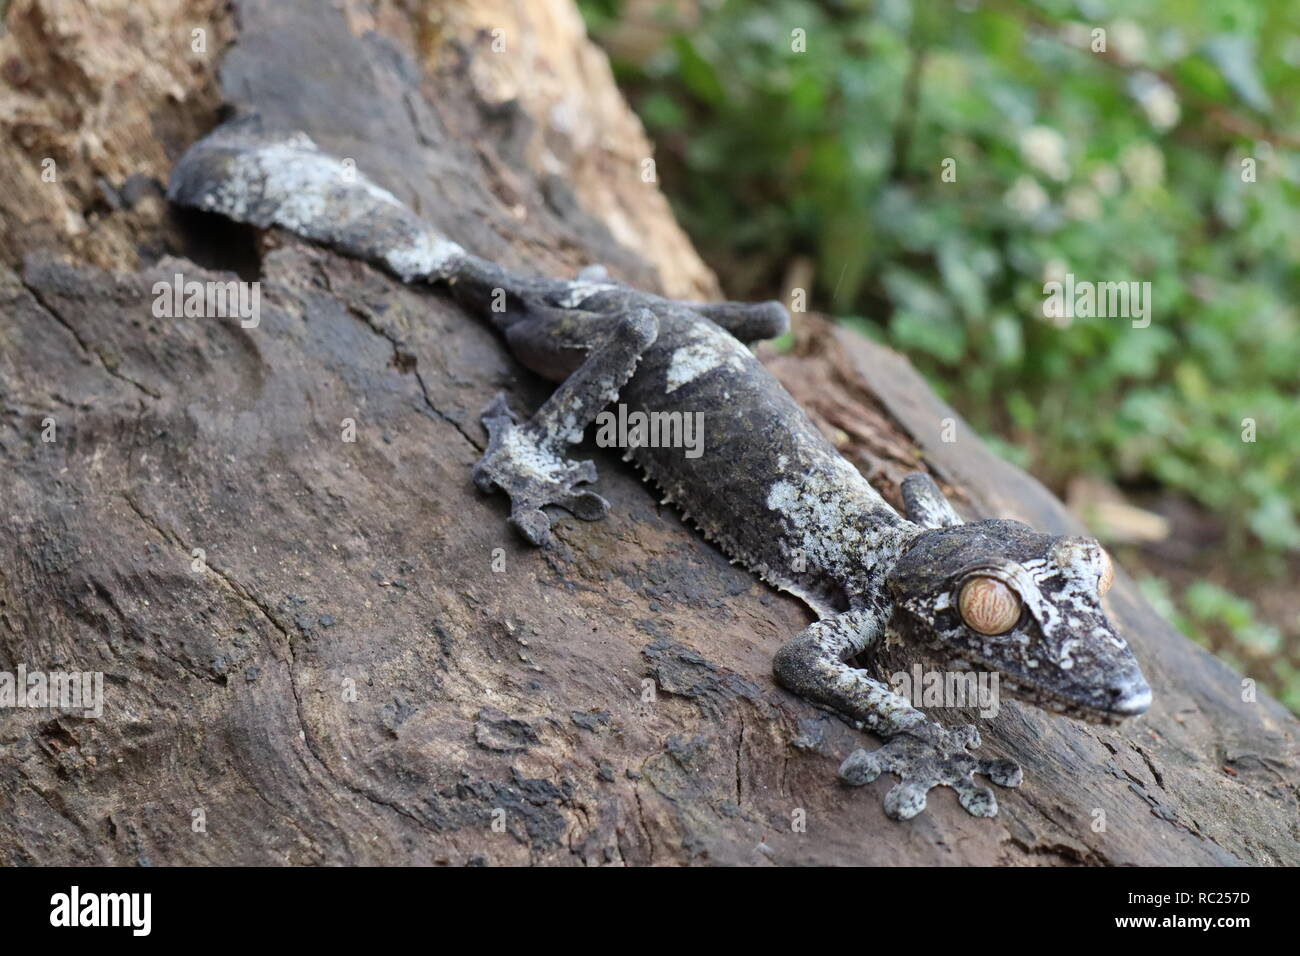 Uroplatus gecko from Madagascar - Stock Image